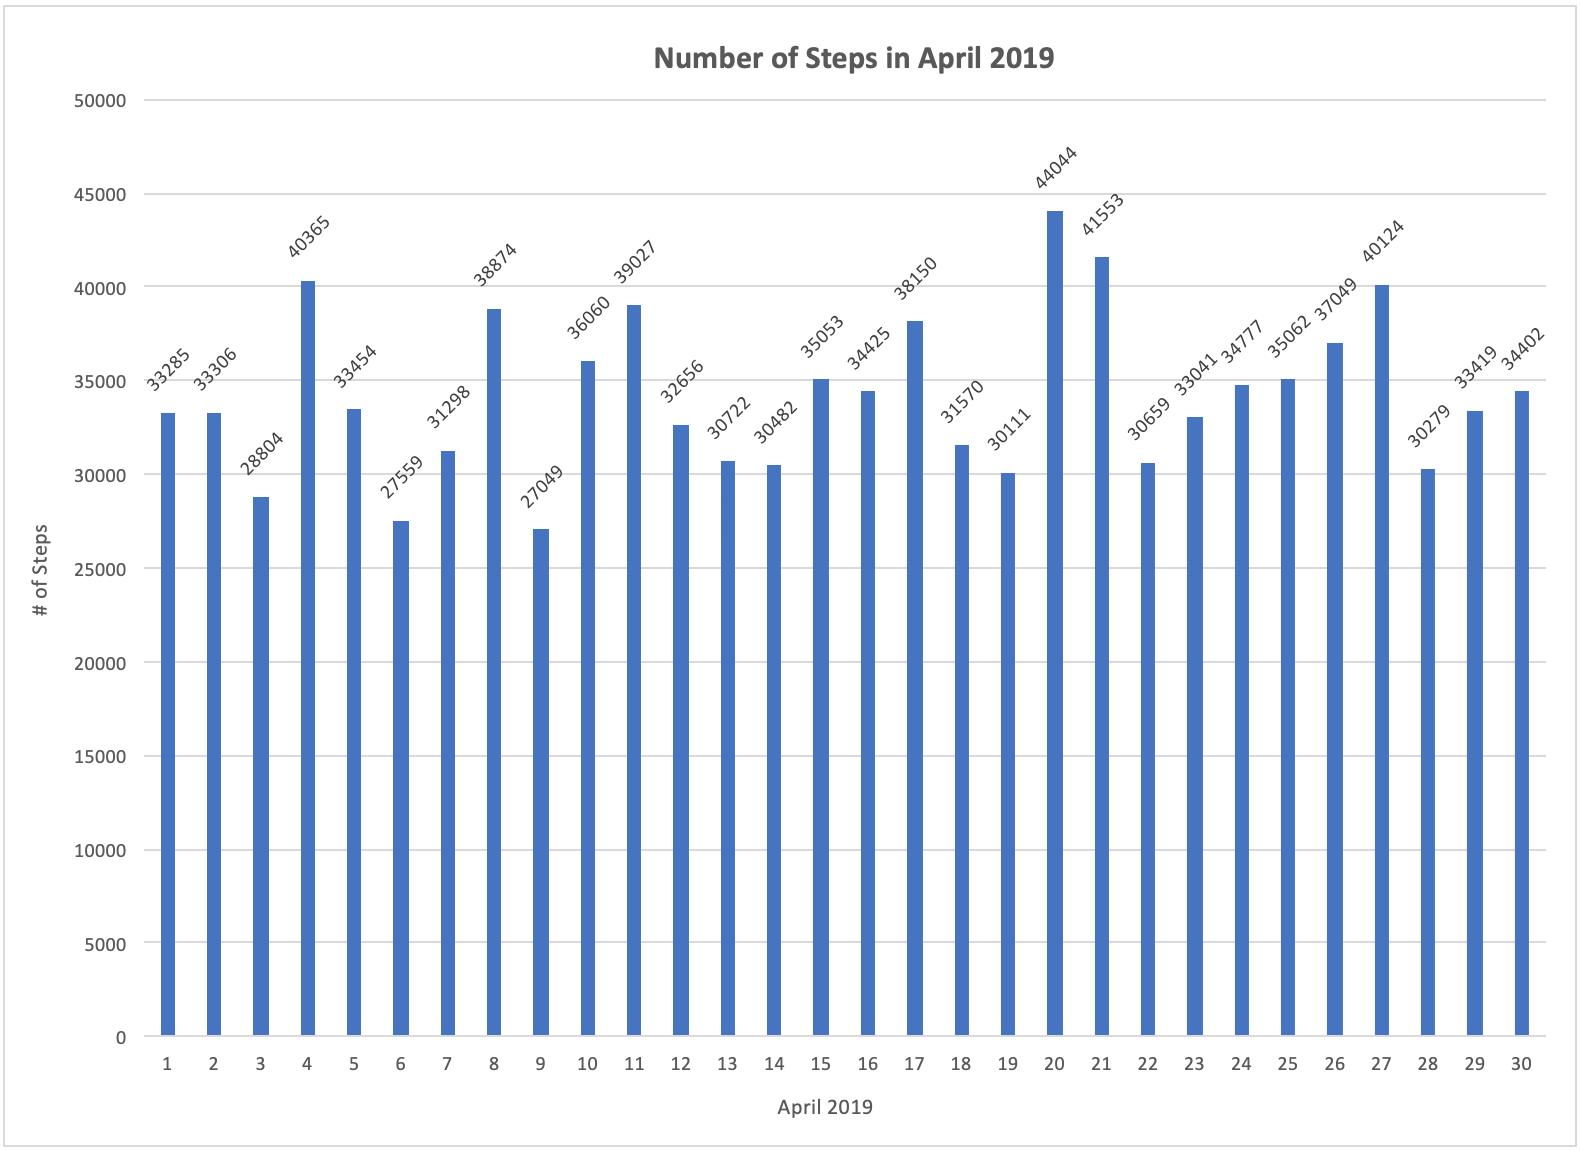 Number of Steps in April 2019.png